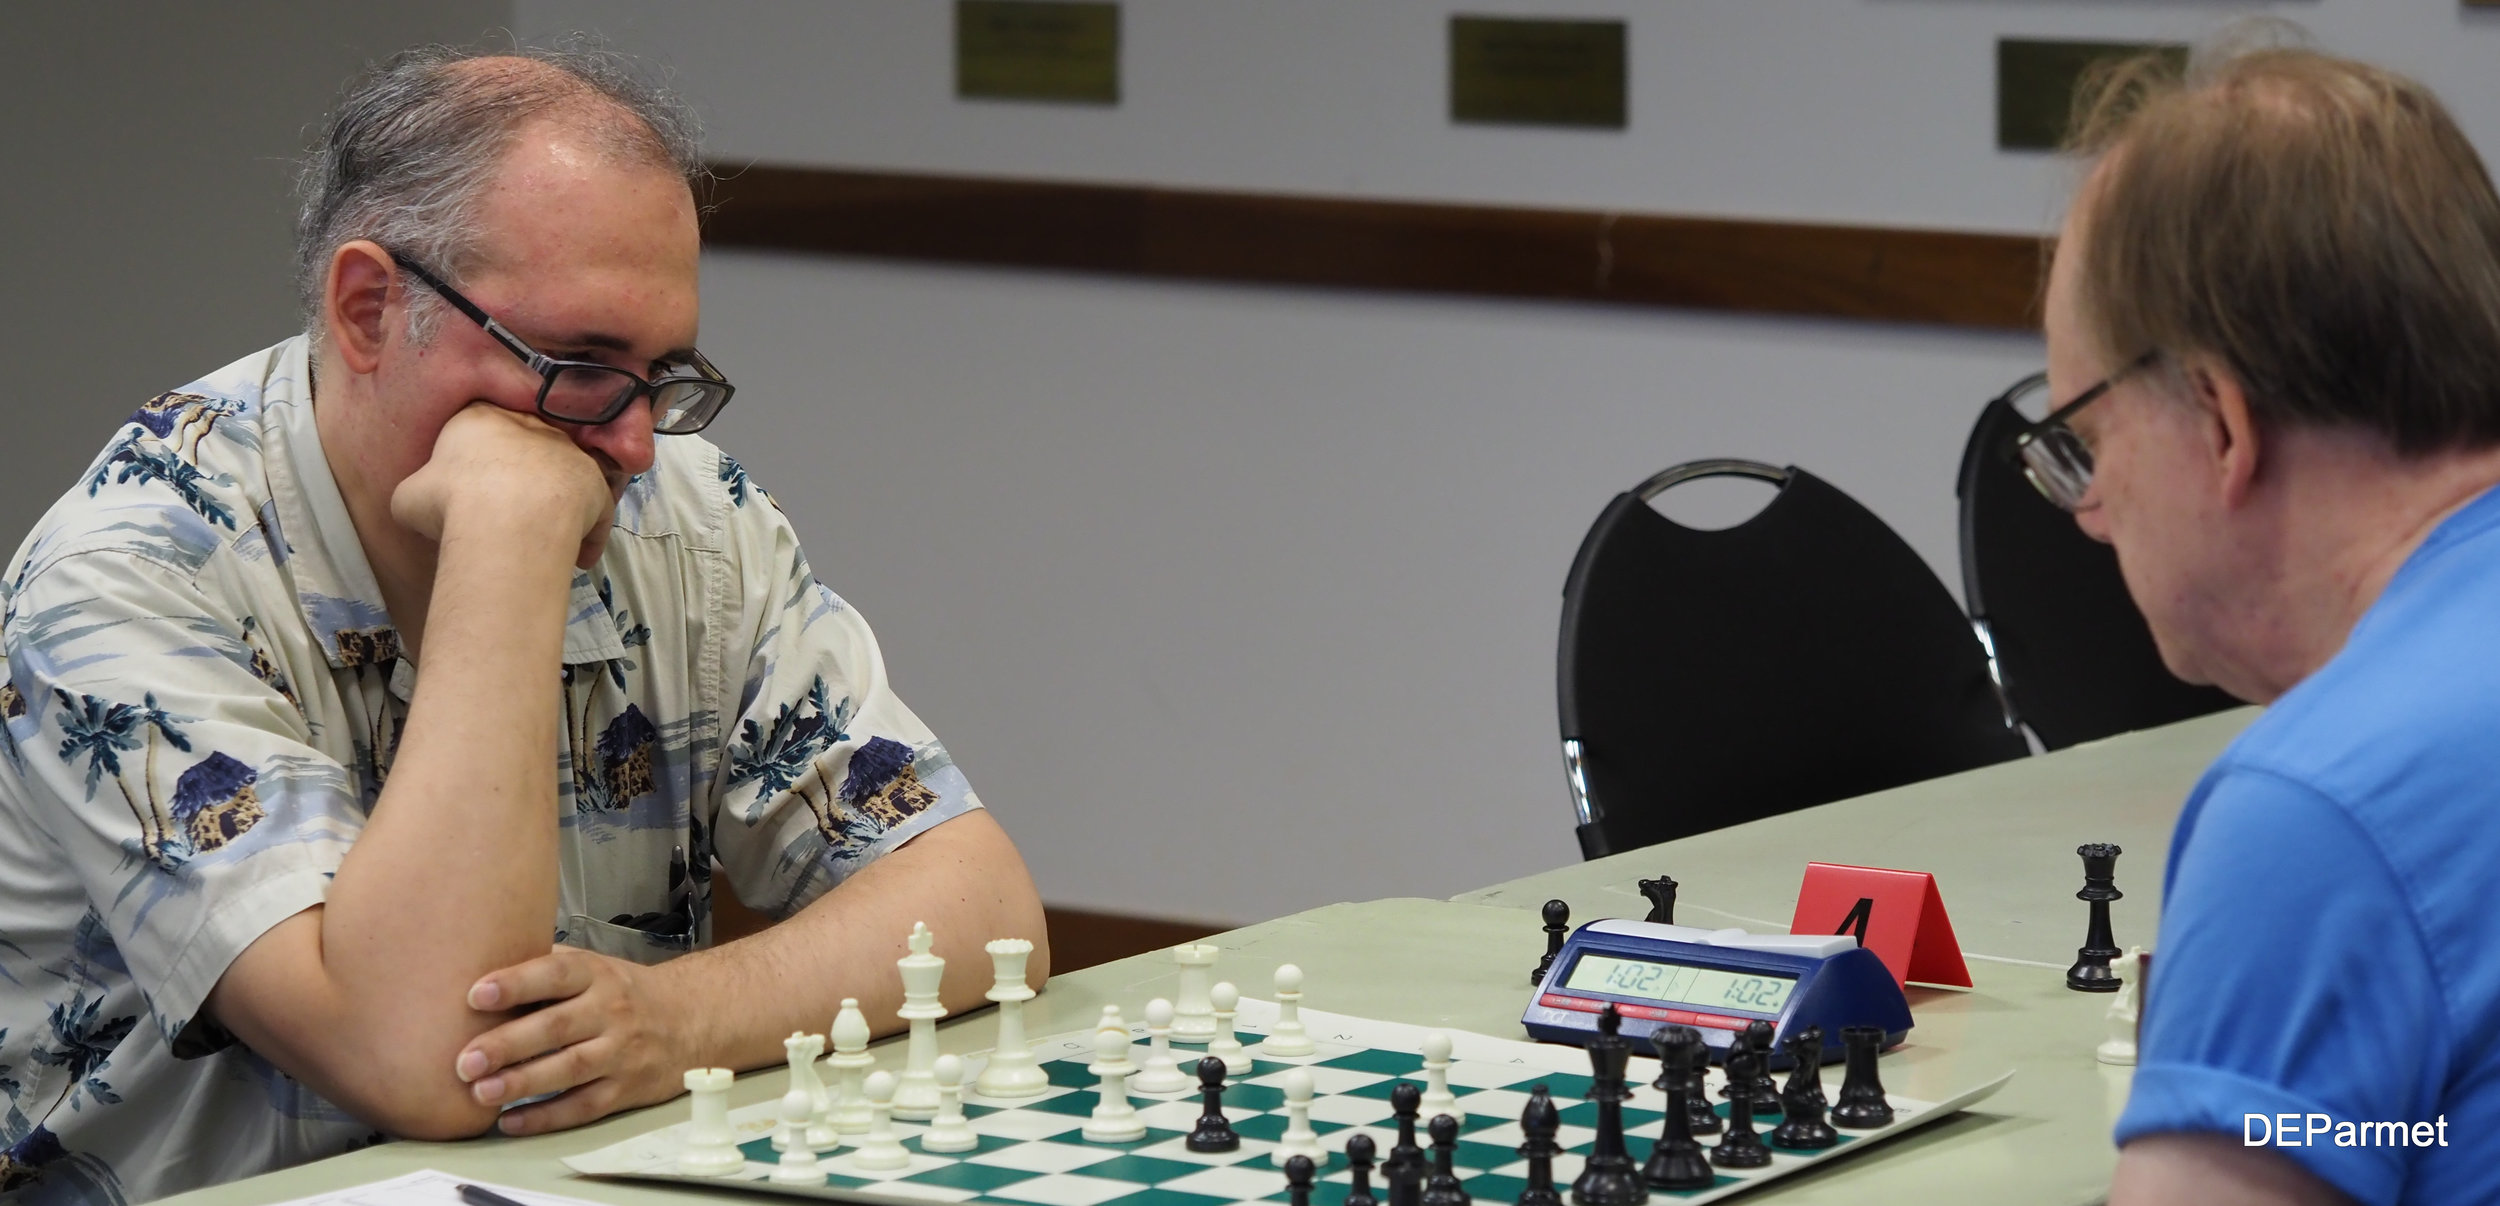 A classic Chicago matchup: NM Steve Szpisjak faces off against Steinitz's wildest disciple, Bill Smythe.